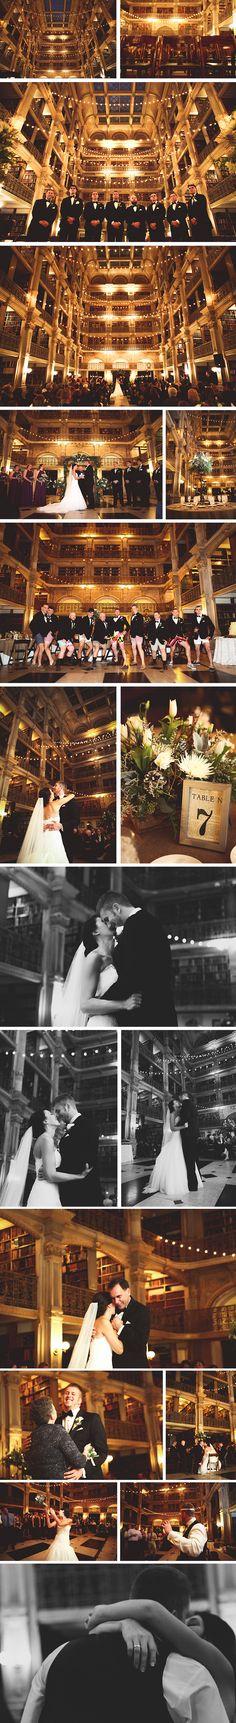 George Peabody Library Historic Baltimore Maryland Wedding Venue   Winter Wedding Cafe Lights Ceremony Literary  peabodyevents.library.jhu.edu